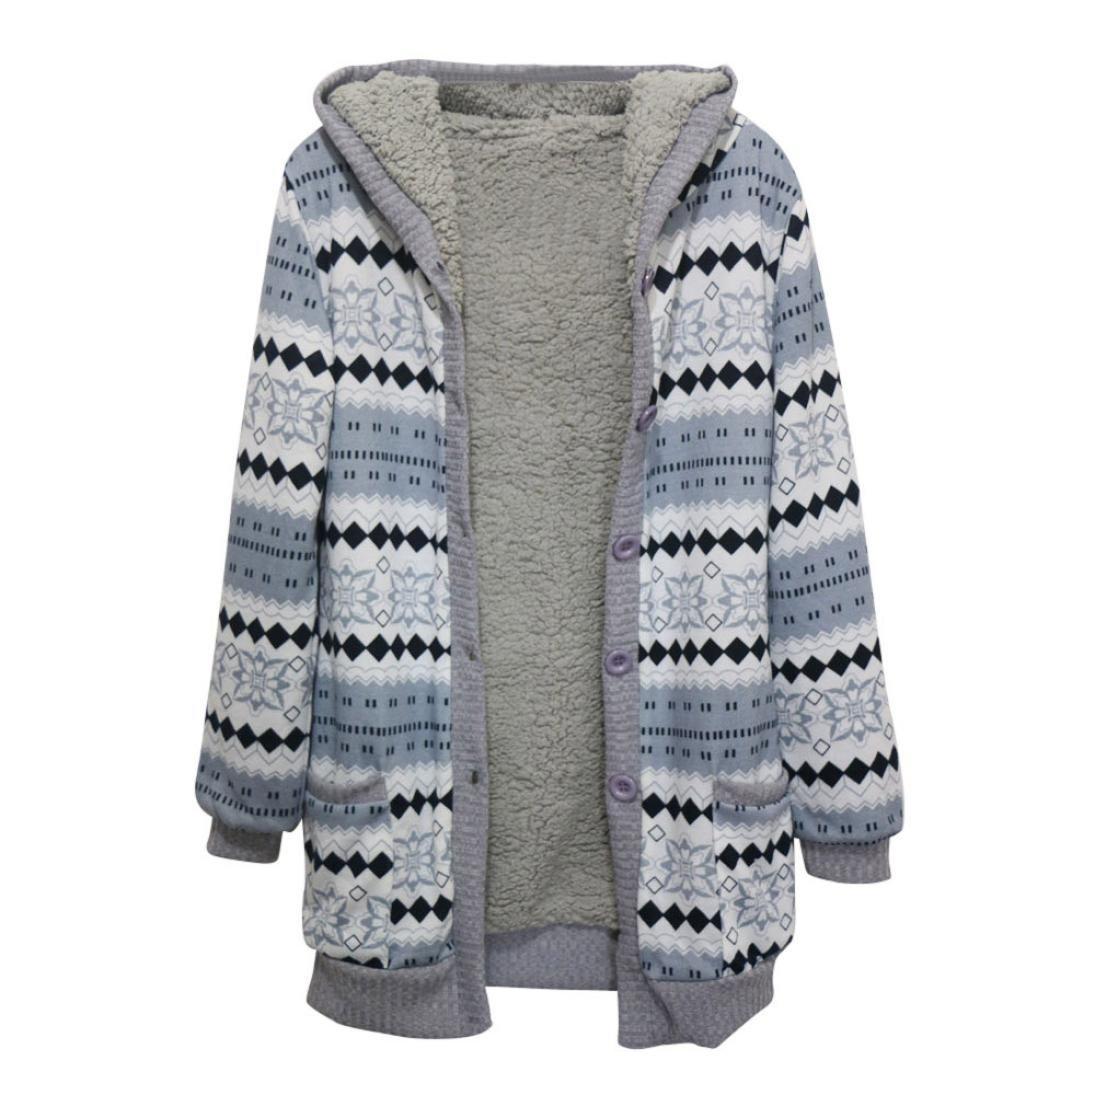 DaySeventh Women Winter Warm Hooded Velvet Thickening Jacket Coat Cardigan DaySeventh-21